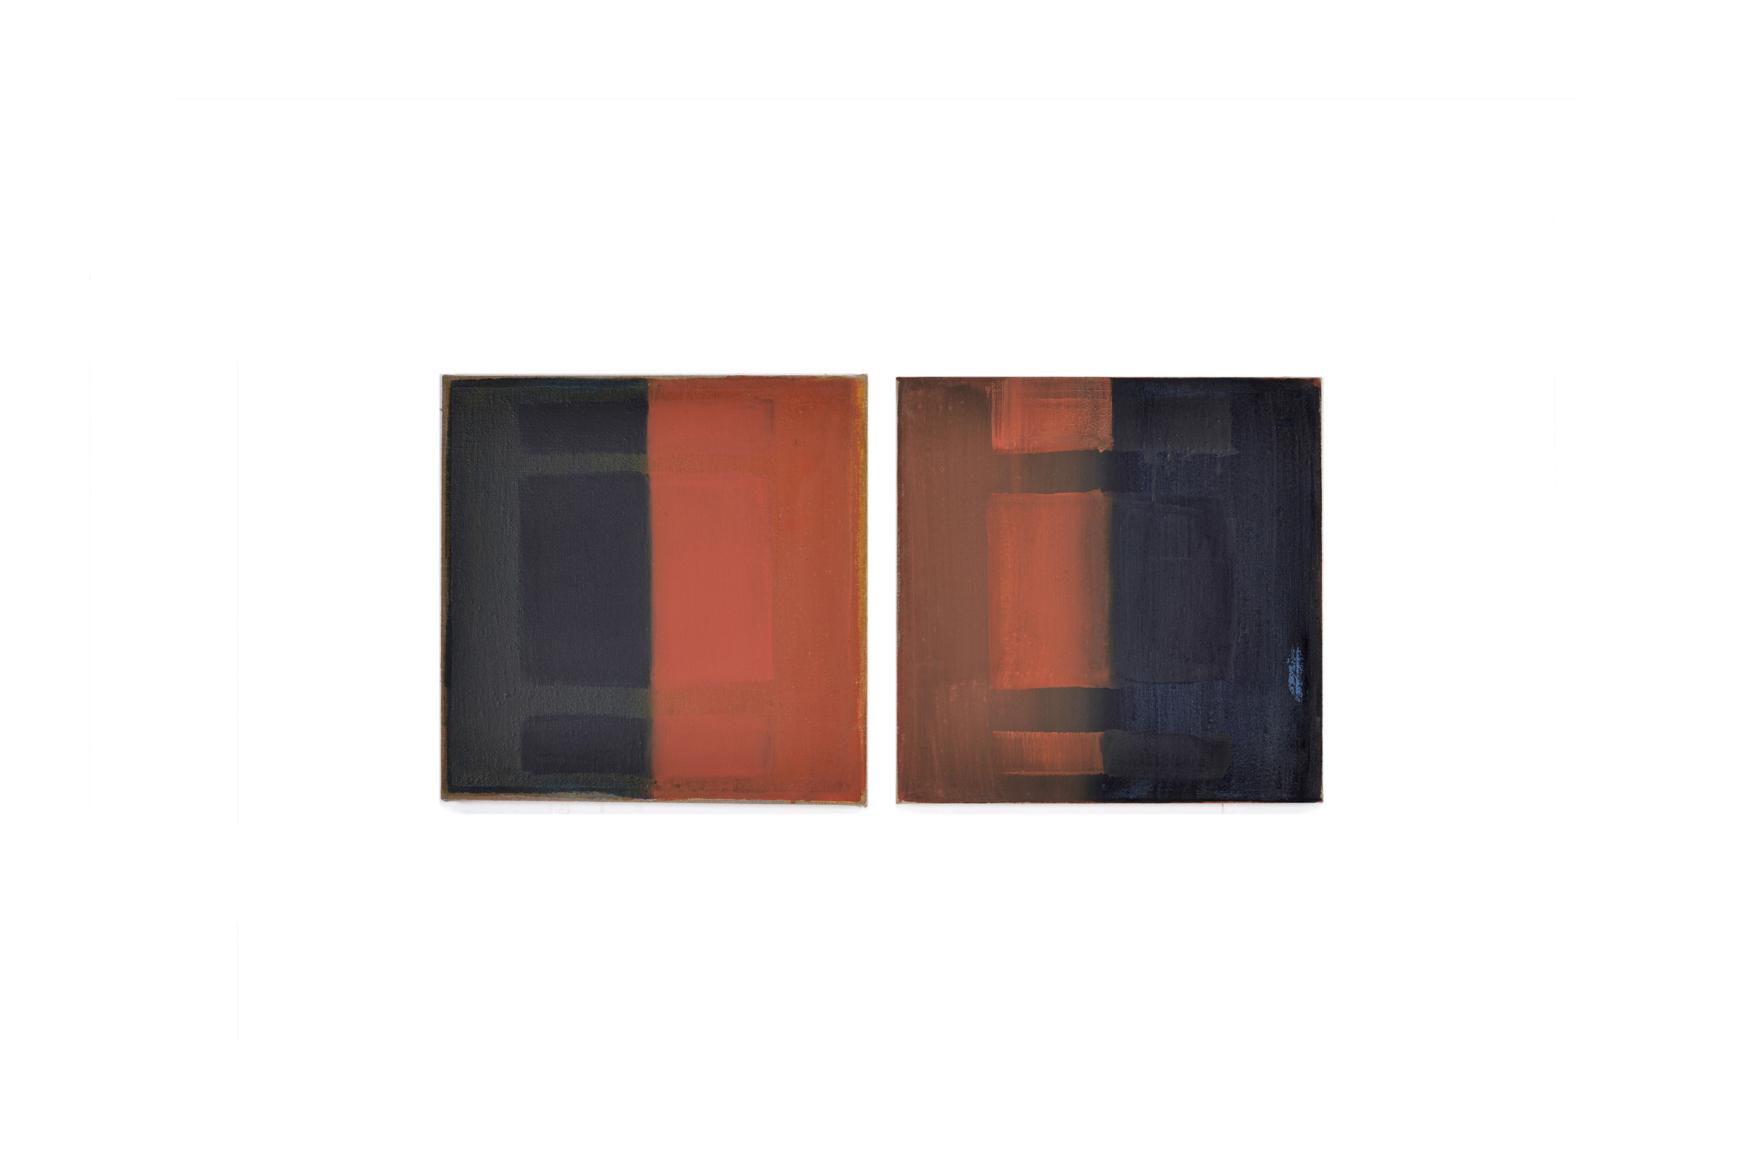 blau-rot, 2017, 35x35 | blu-rosso, 2017, 35x35